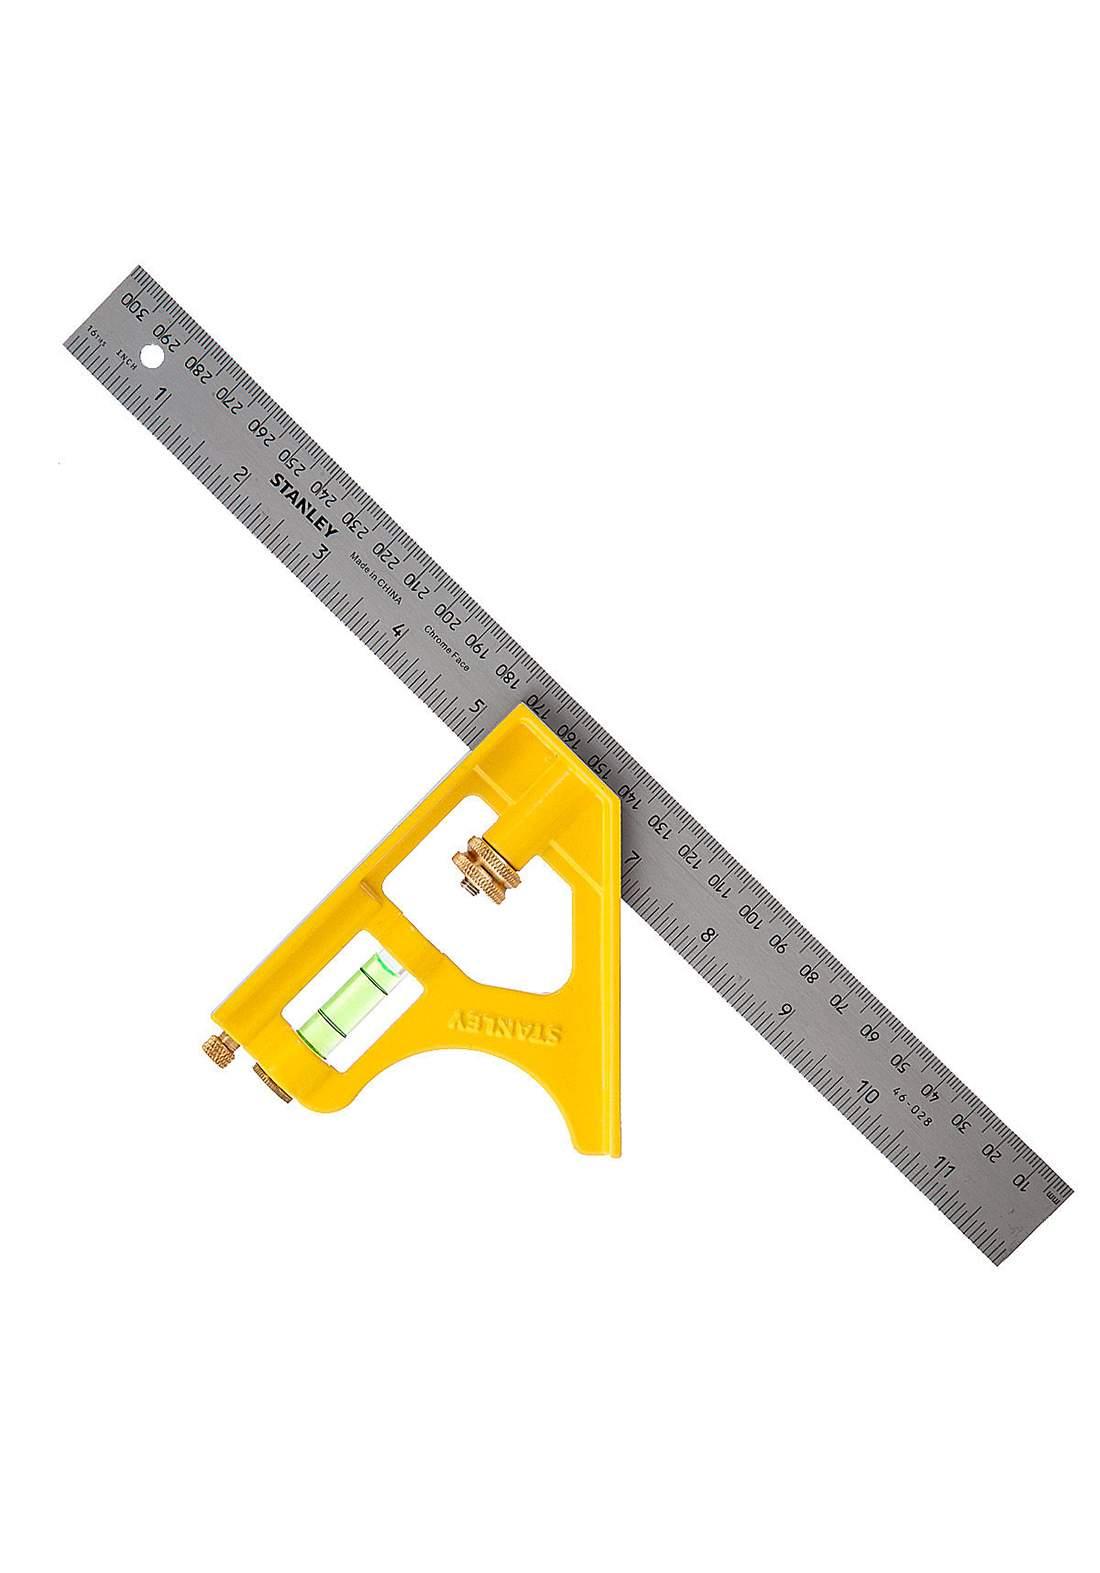 Stanley 2-46-028 Steel Square Aluminum Handle 300mm كونيه